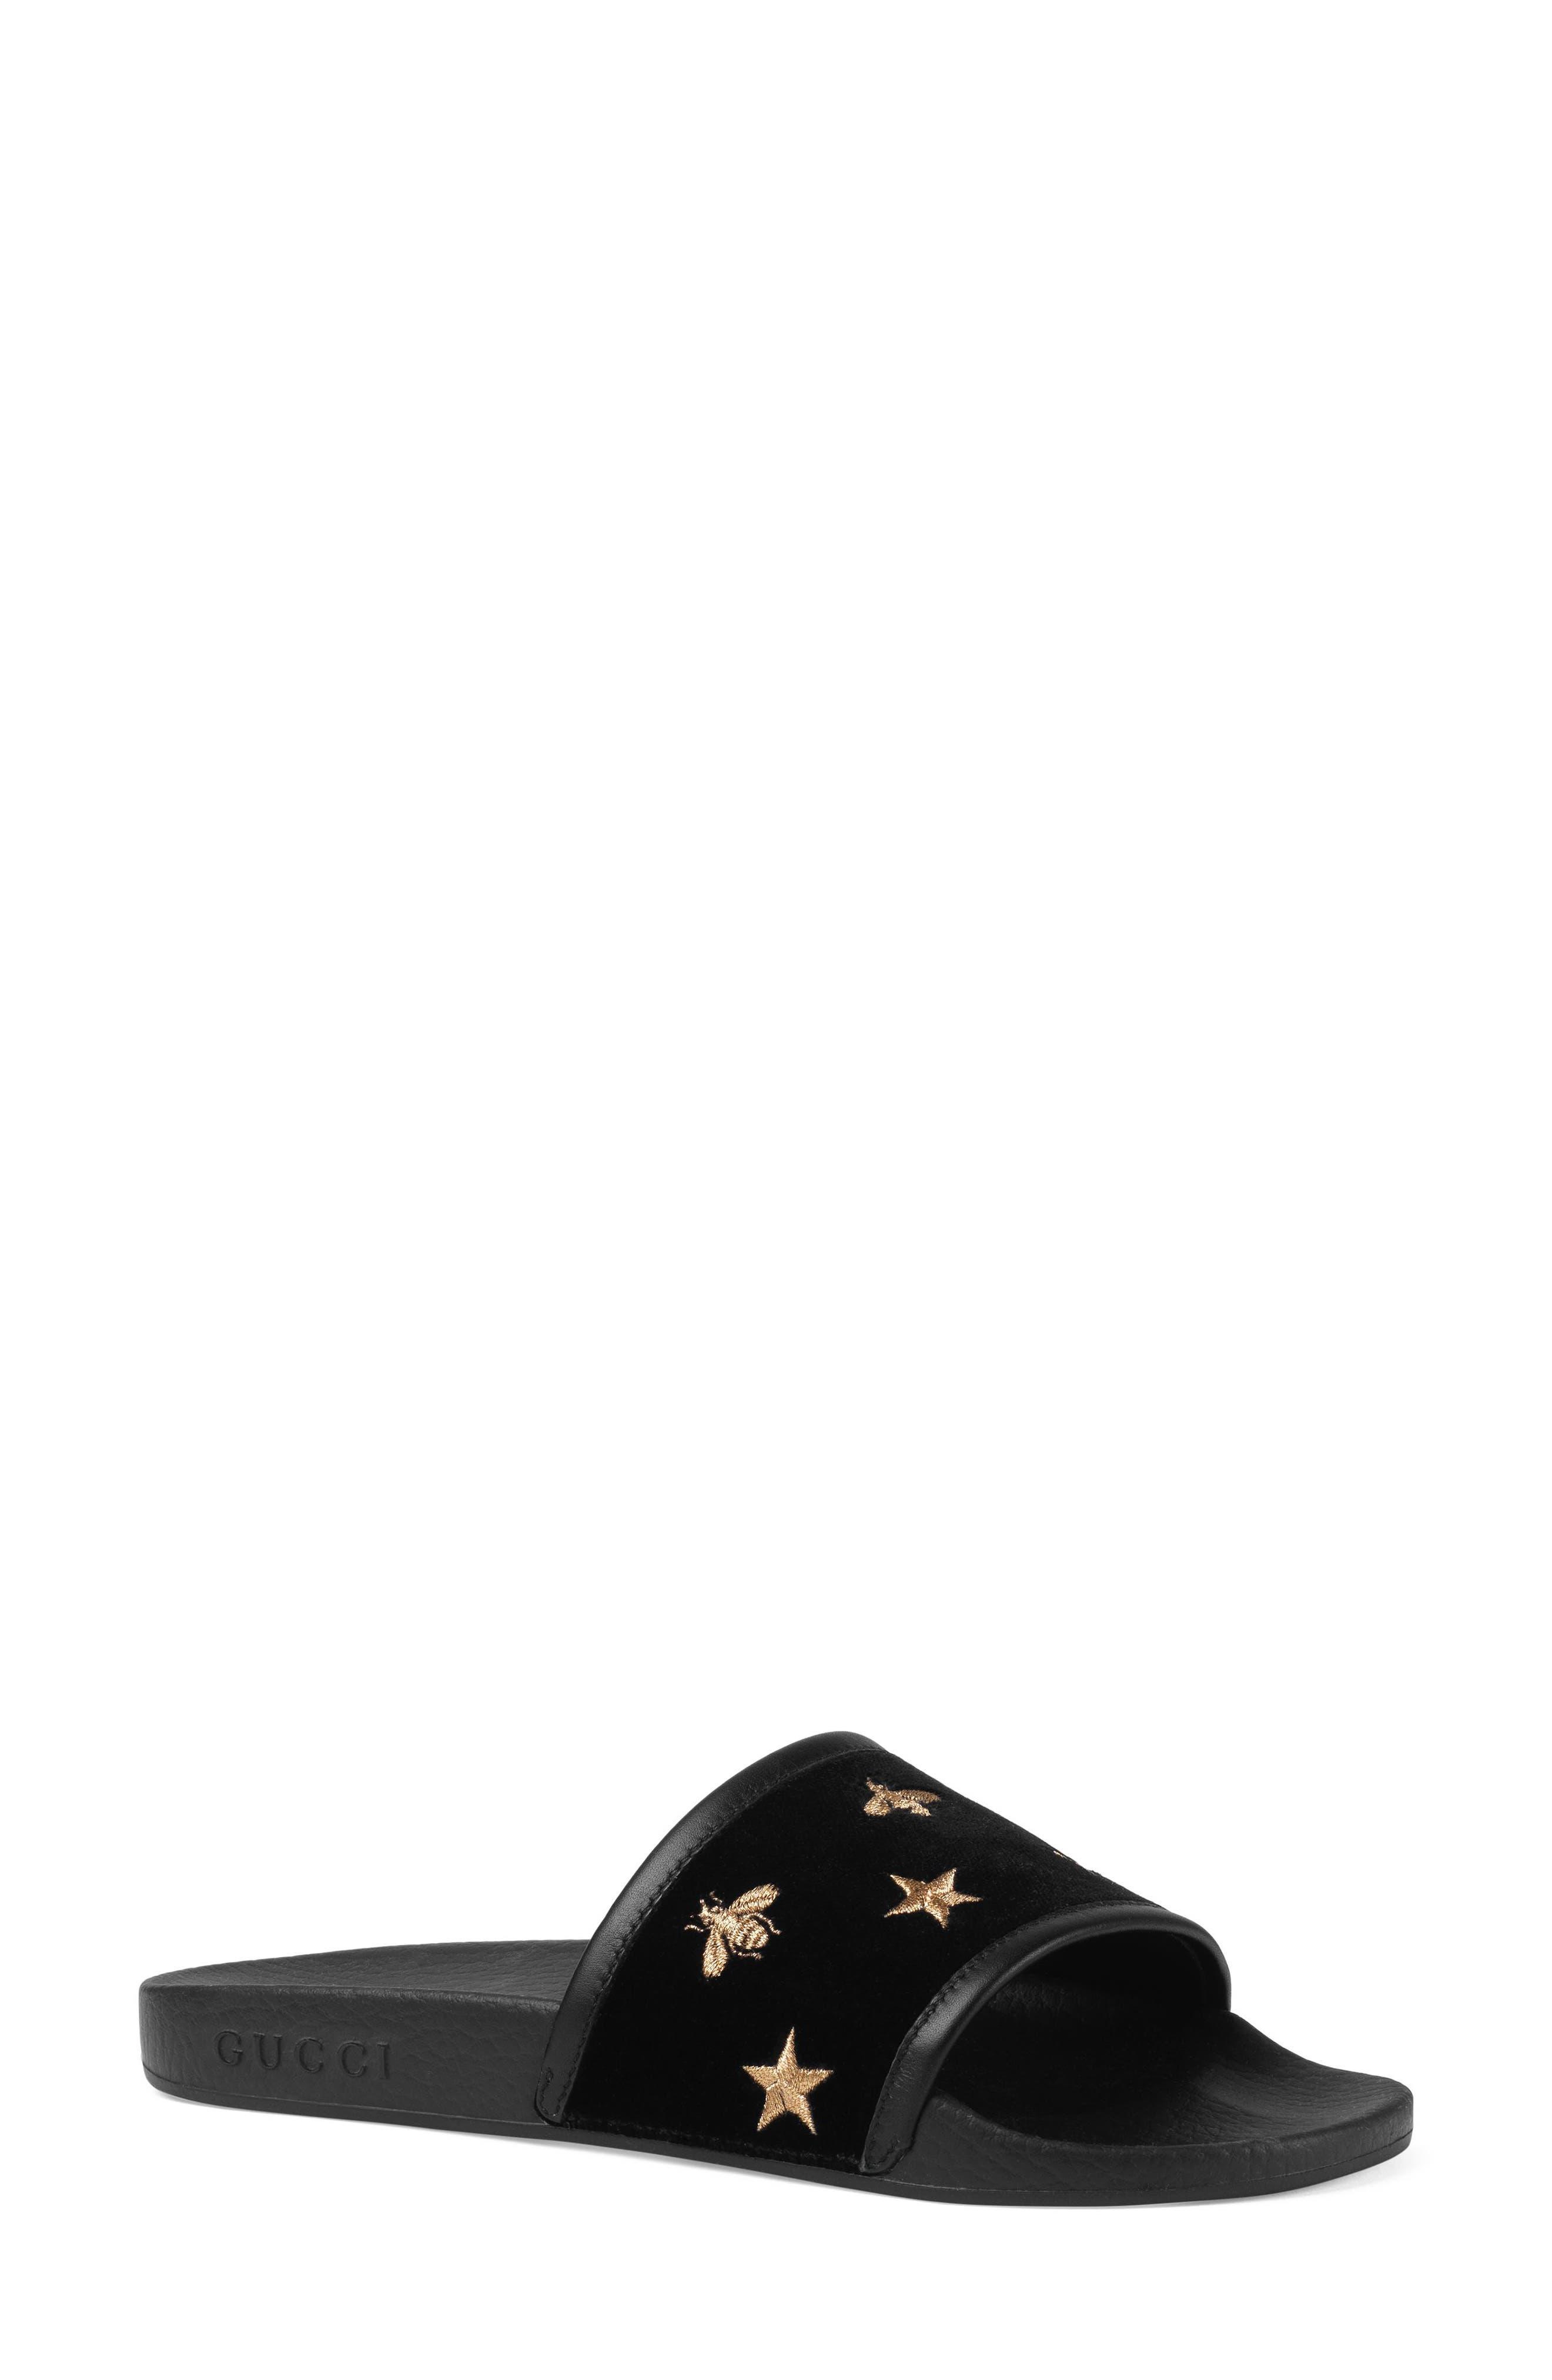 Pursuit Embroidered Slide Sandal,                             Main thumbnail 1, color,                             Black